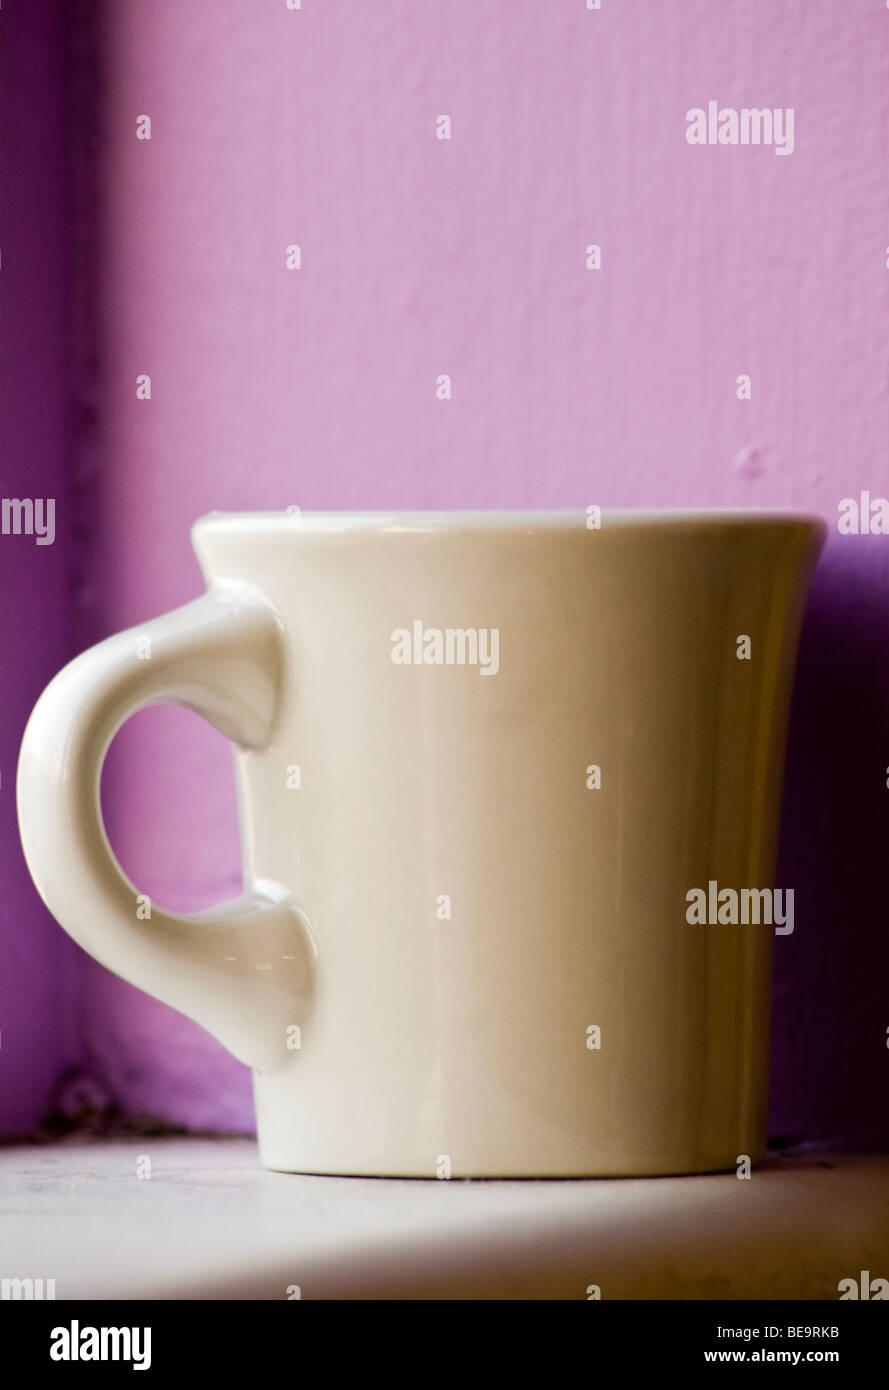 Close up detail of ceramic coffee mug - Stock Image